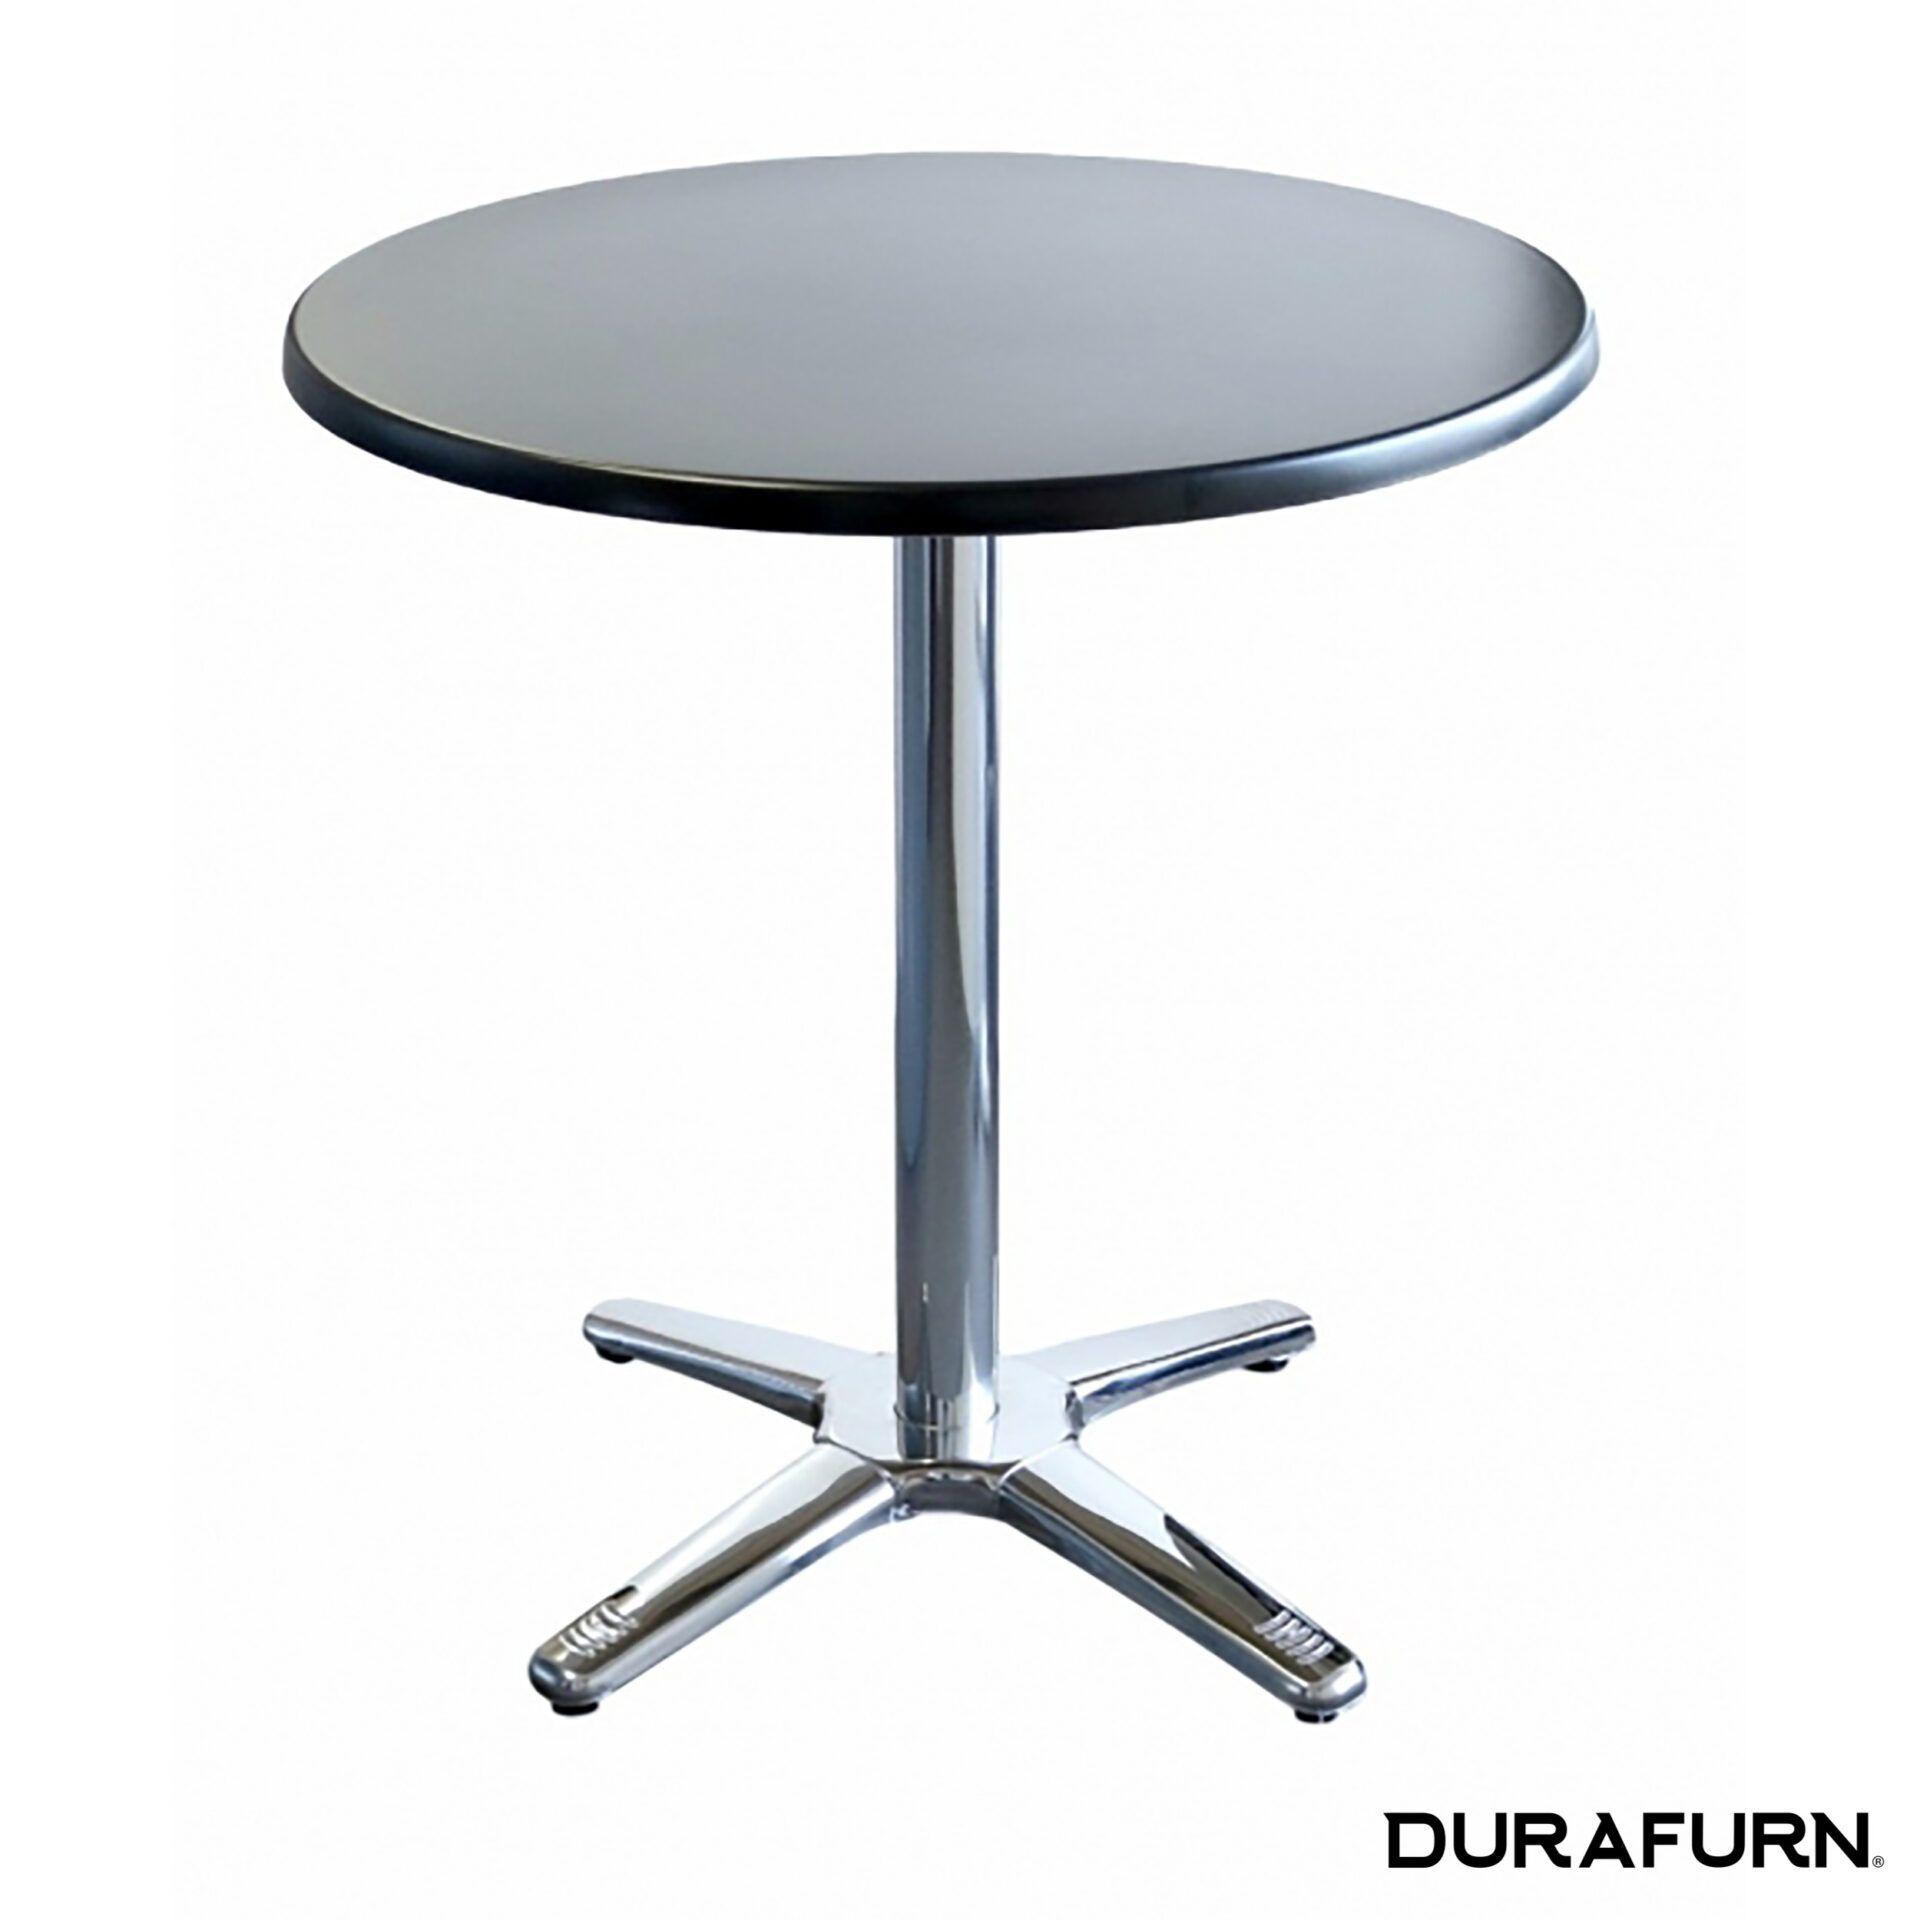 Roma Table Base Round Table74g6Xa